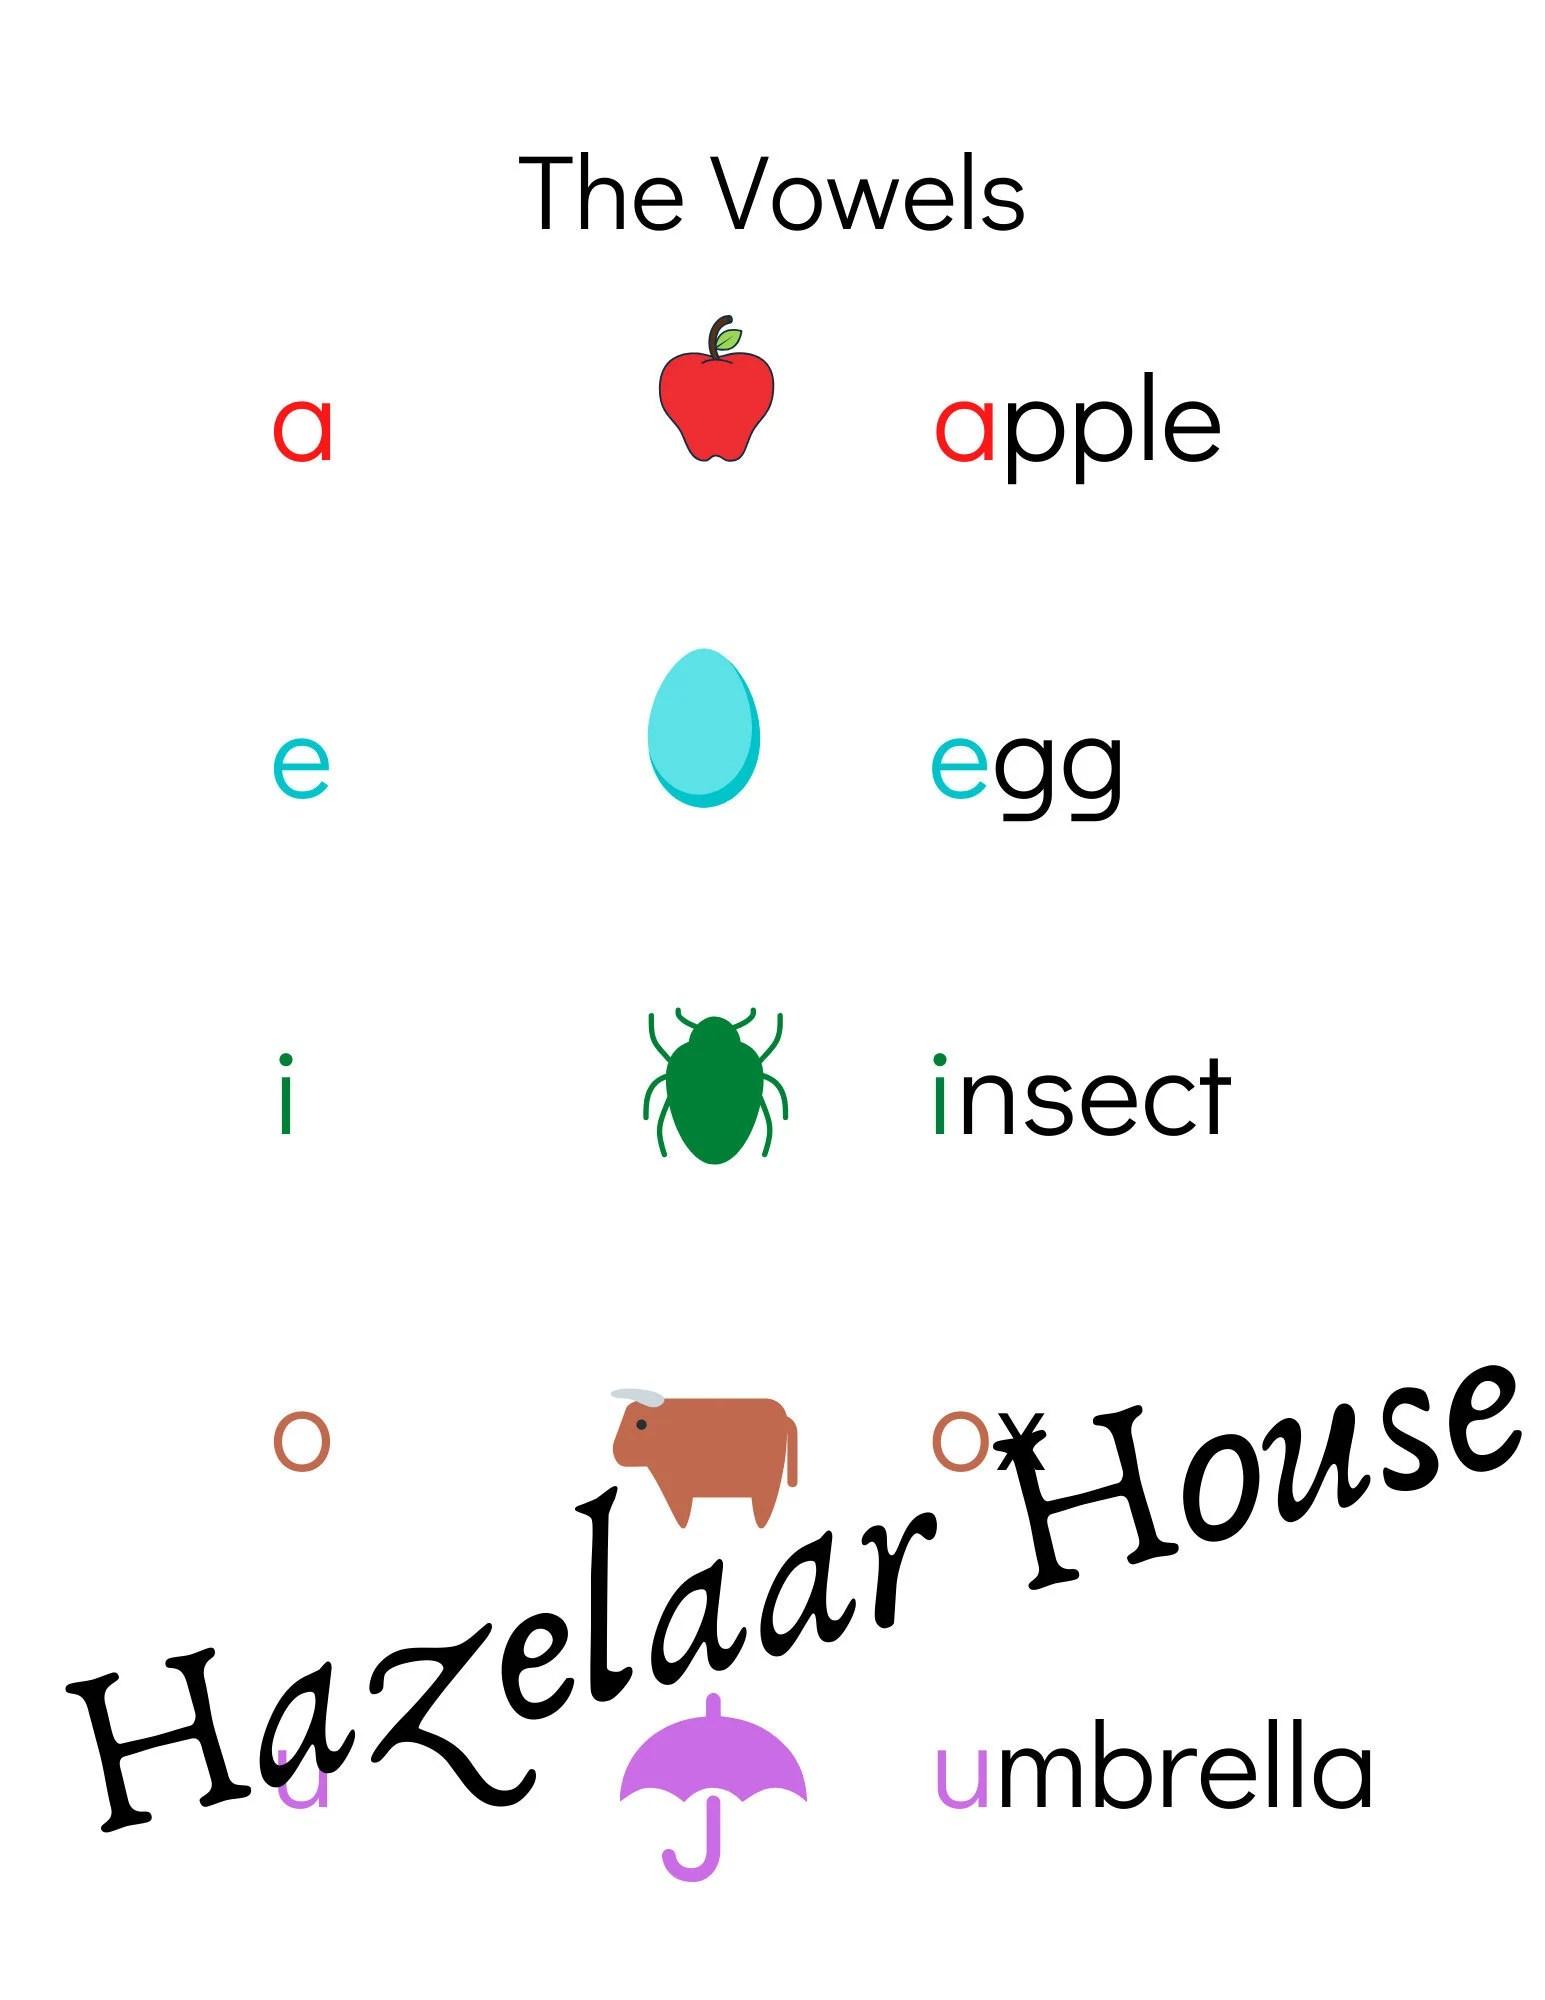 Vowel Sounds Phonics Homeschool Worksheets For Kids Ages